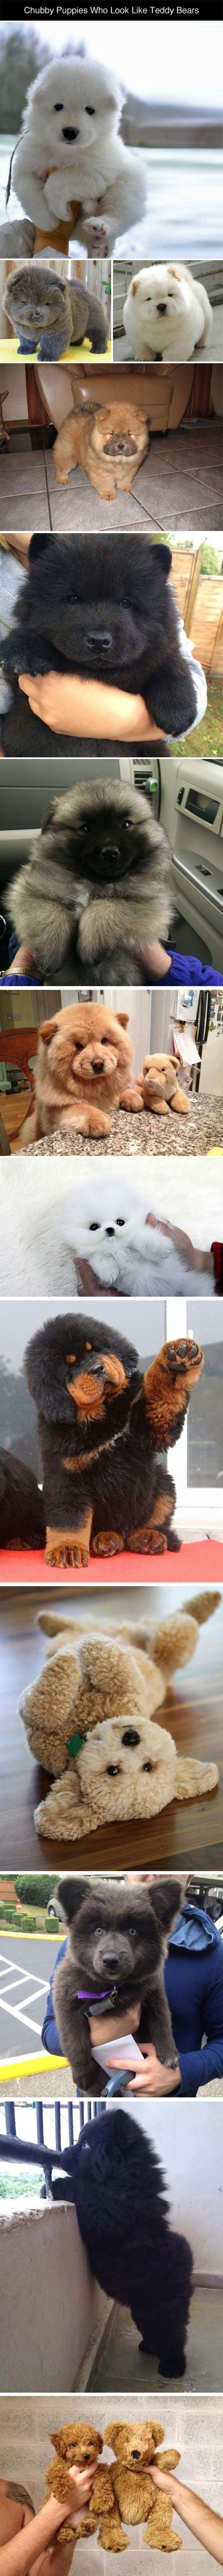 Some Puppies Who Look Like Teddy Bears